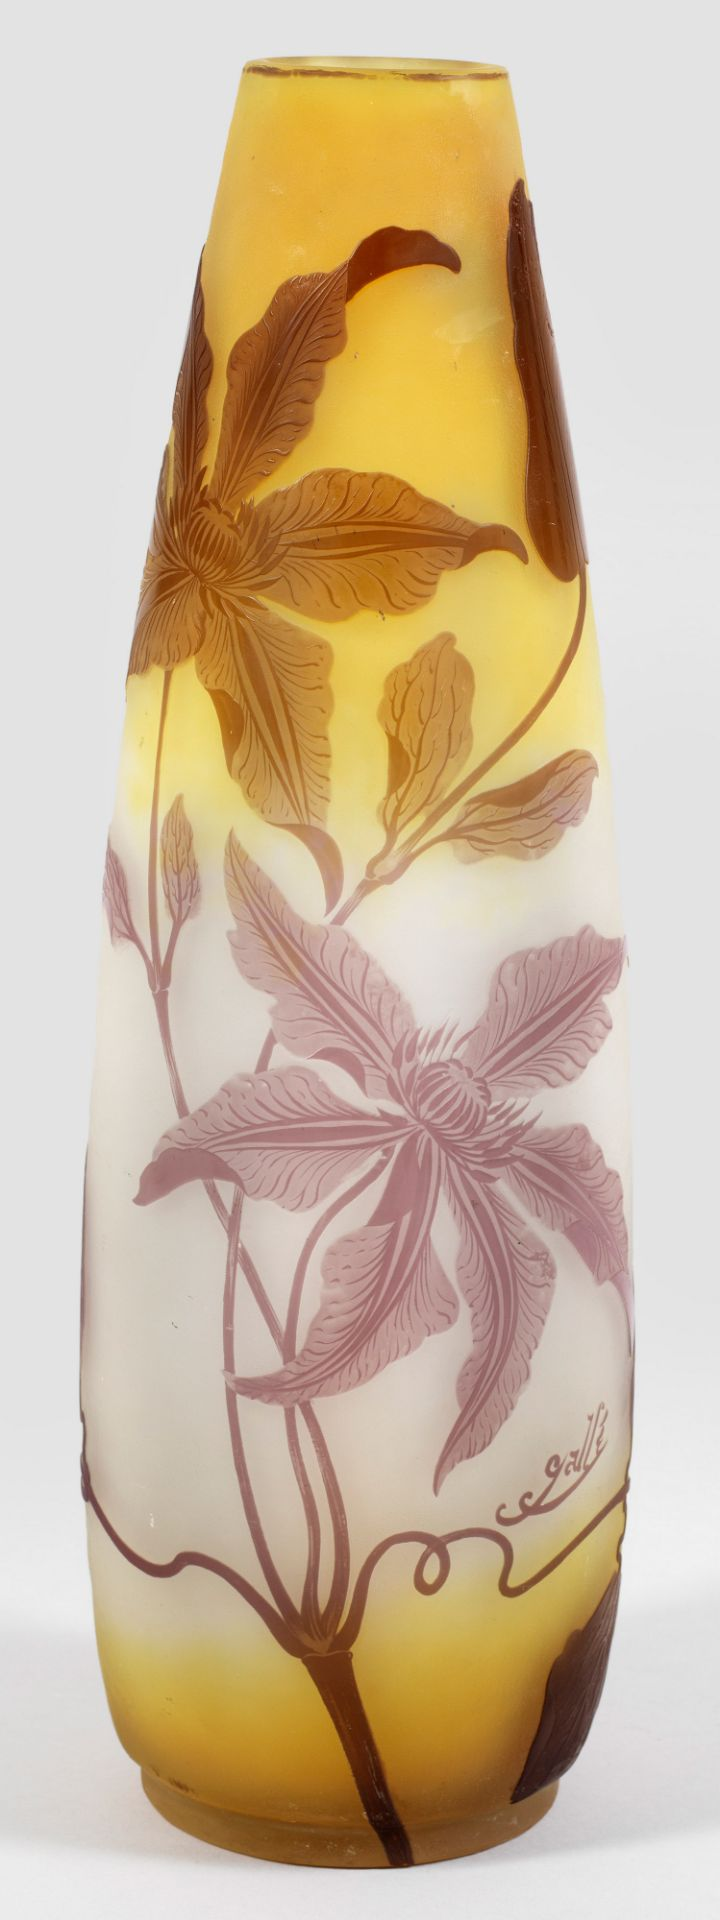 Große Gallé-Vase mit Clematis-Dekor